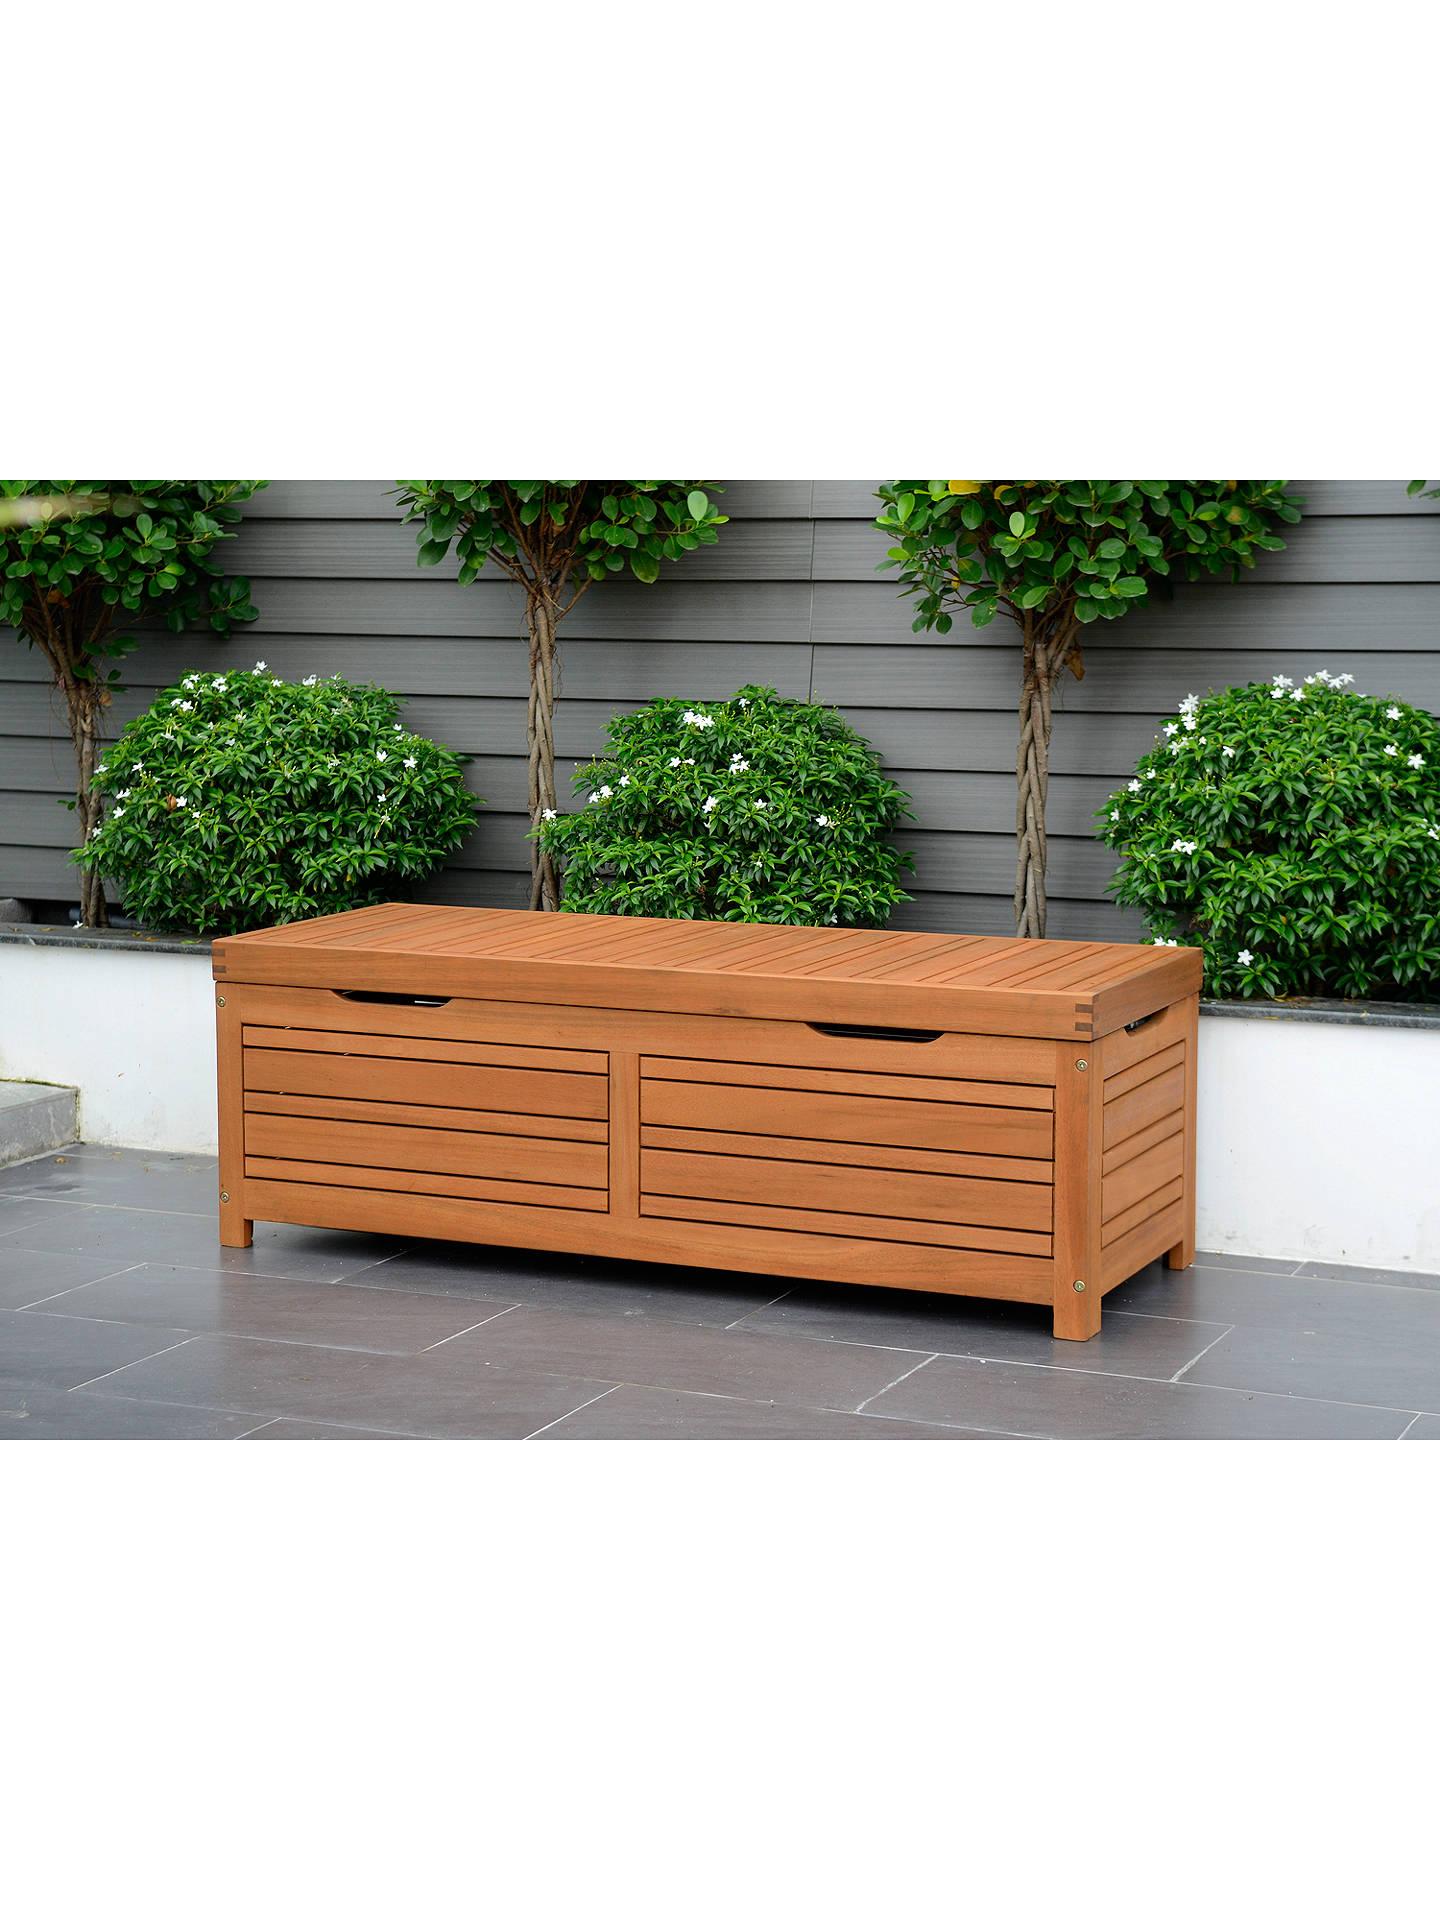 Prime John Lewis Partners Venice Storage Box And Bench Fsc Certified Eucalyptus Wood Natural Inzonedesignstudio Interior Chair Design Inzonedesignstudiocom